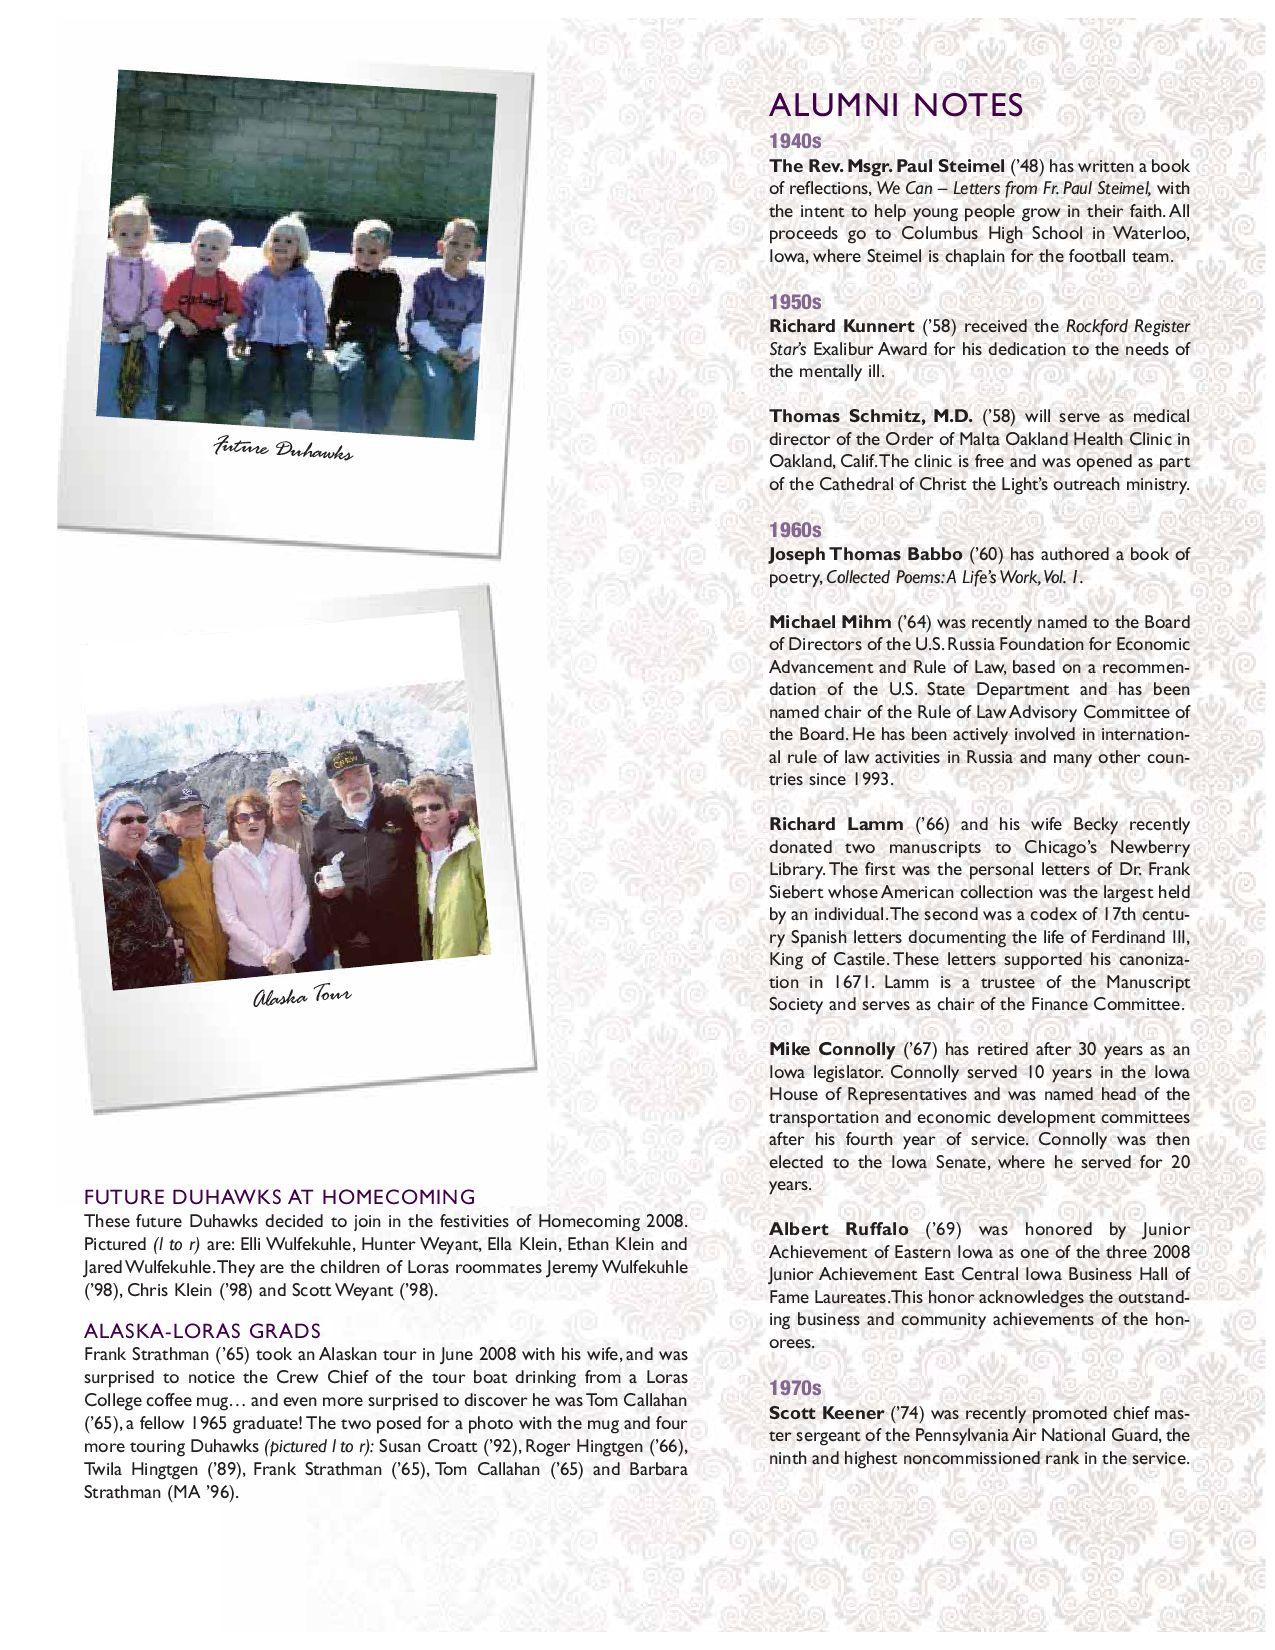 Loras College Magazine - Winter 2009 by Loras College - issuu